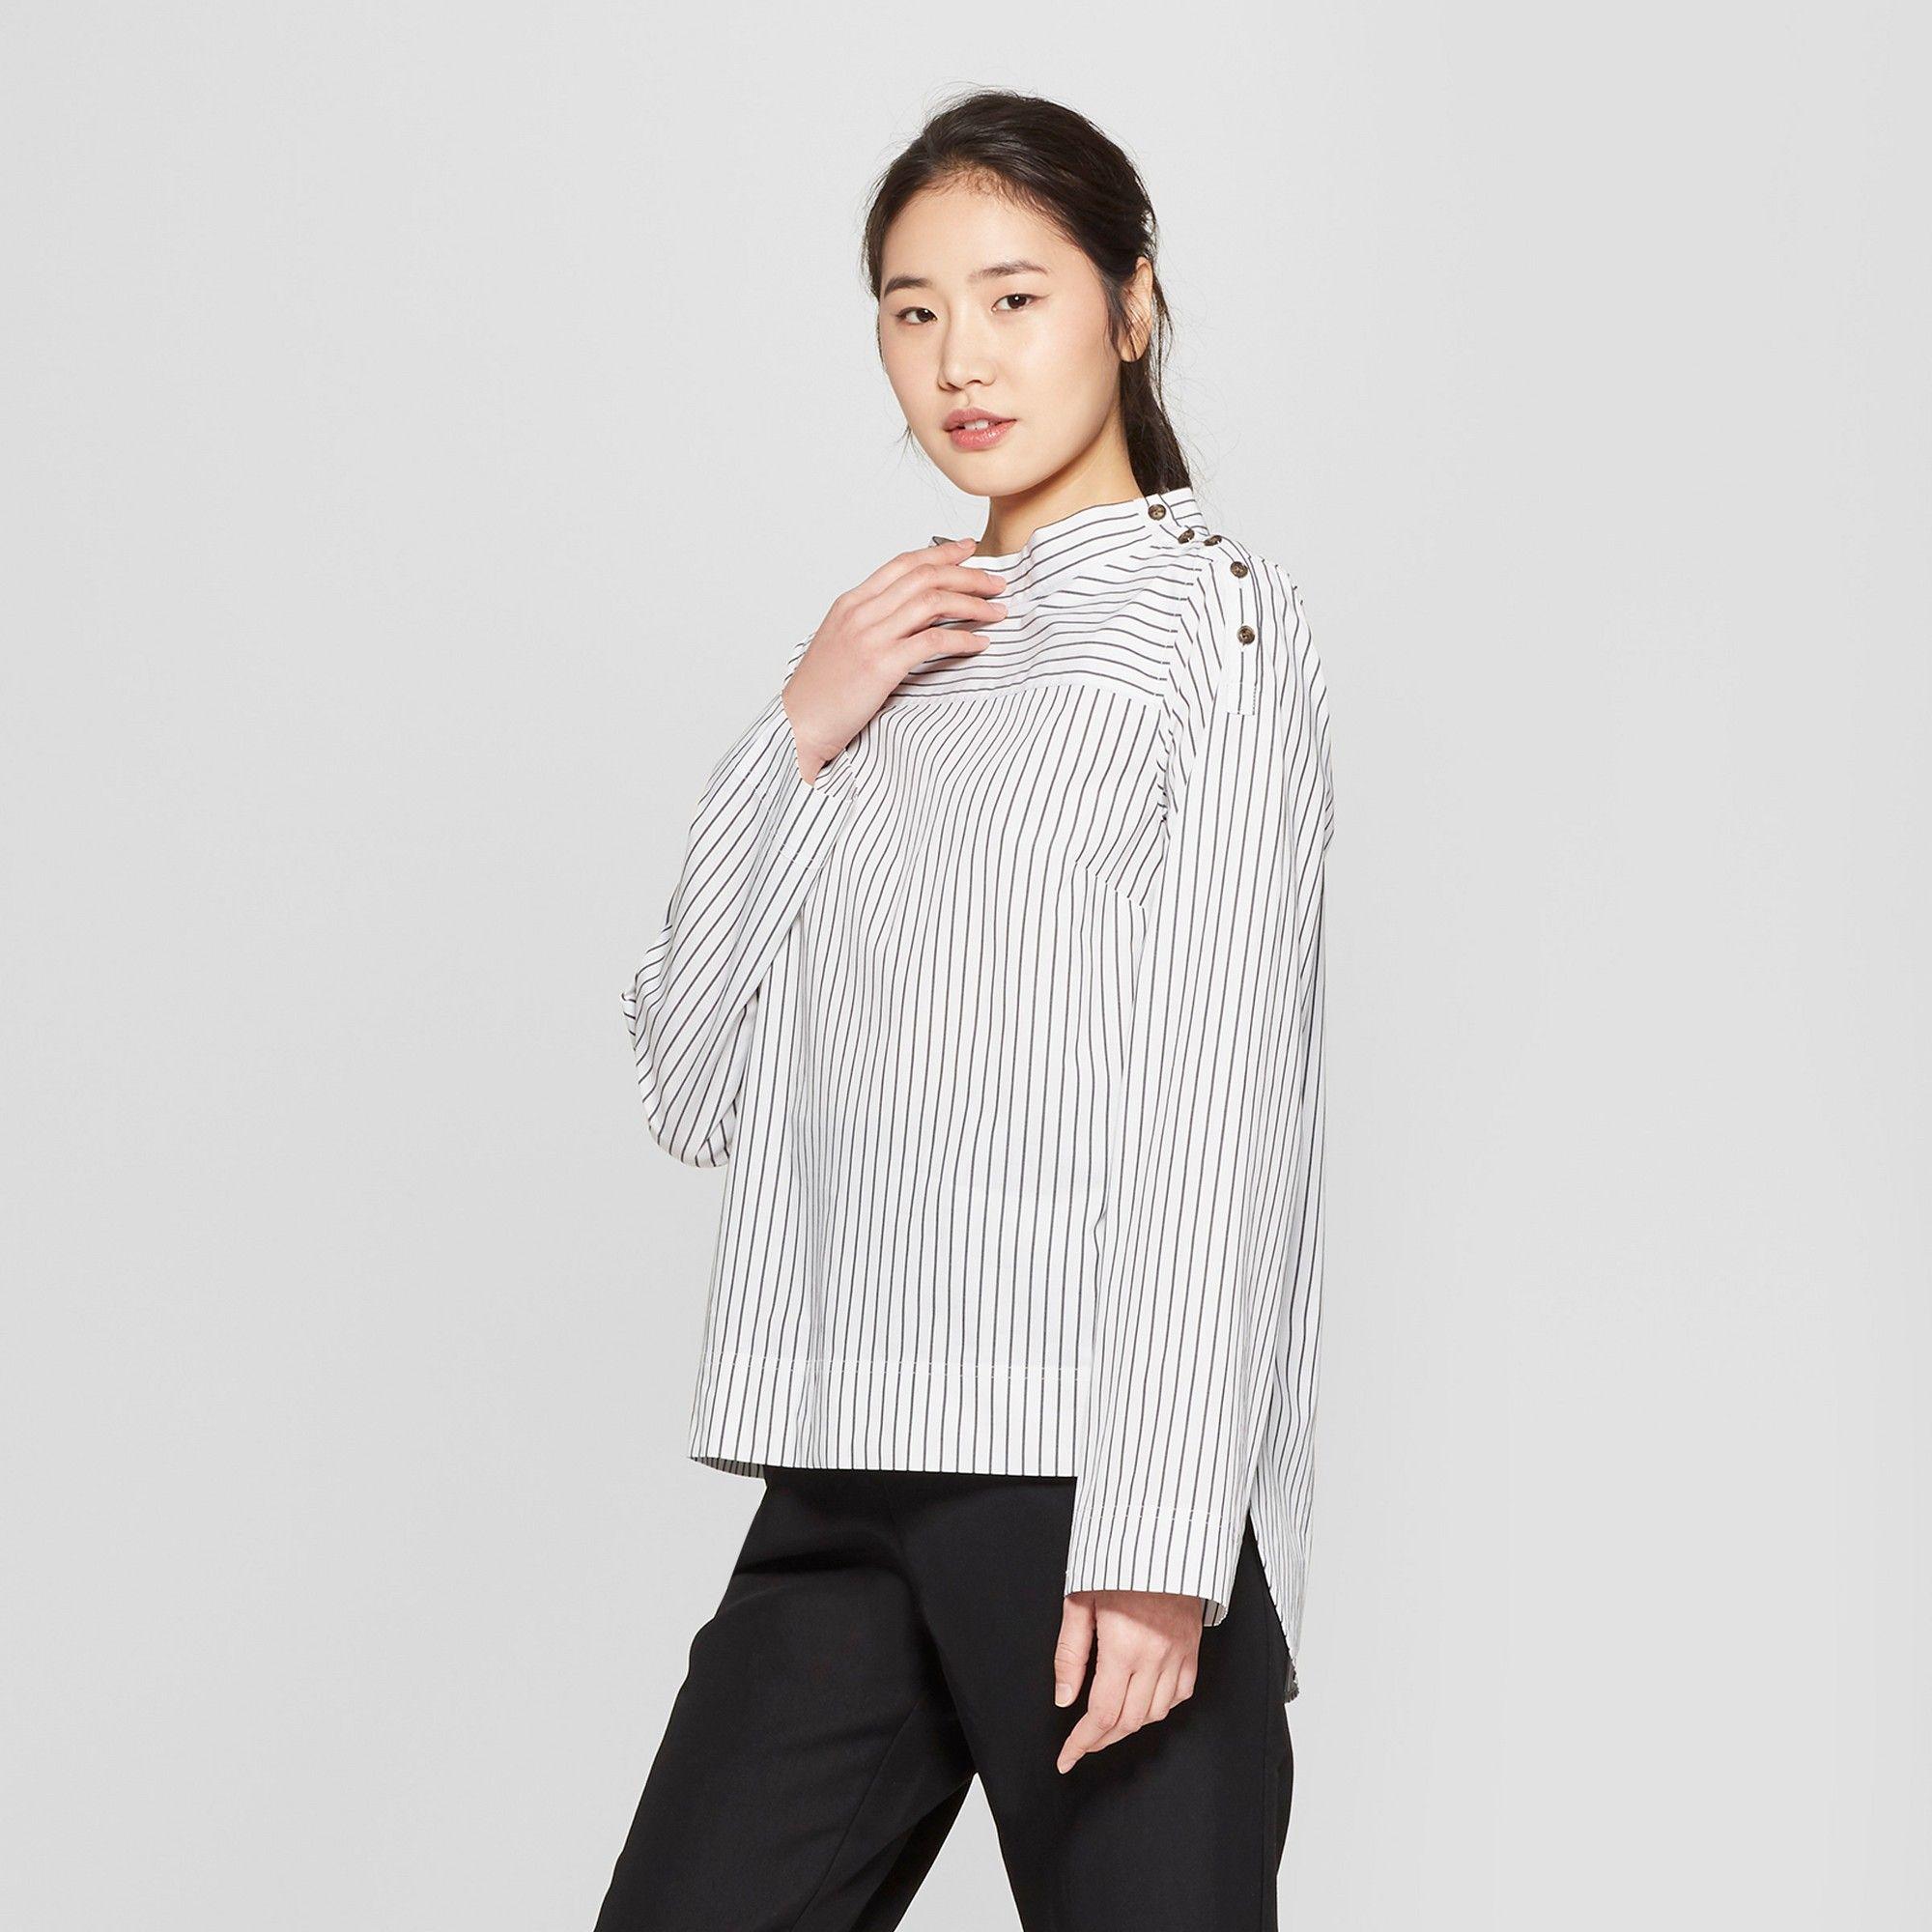 df8432dc Women's Striped Long Sleeve Shoulder Button Popover Blouse - Who What Wear  White/Black Xxl